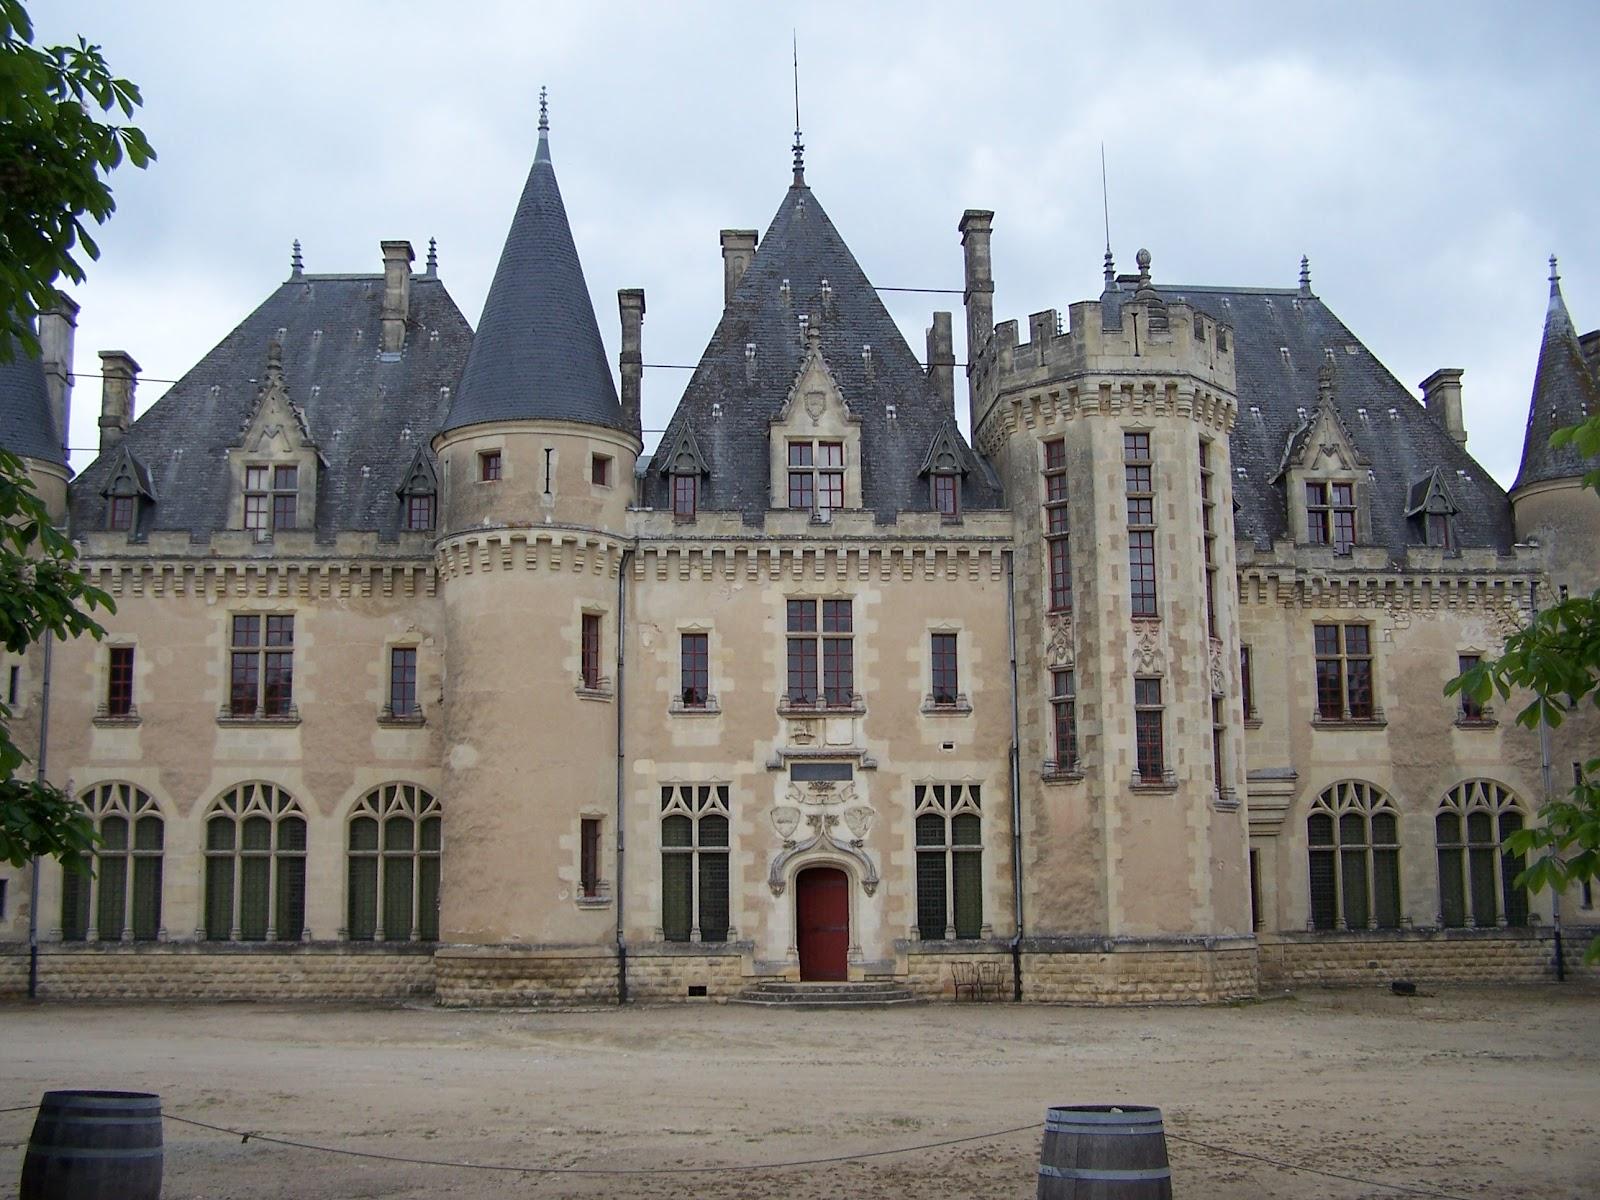 michel de montaigne 1533 1592 pt 1 marcia miner s room a view michel de montaigne 1533 1592 pt 1